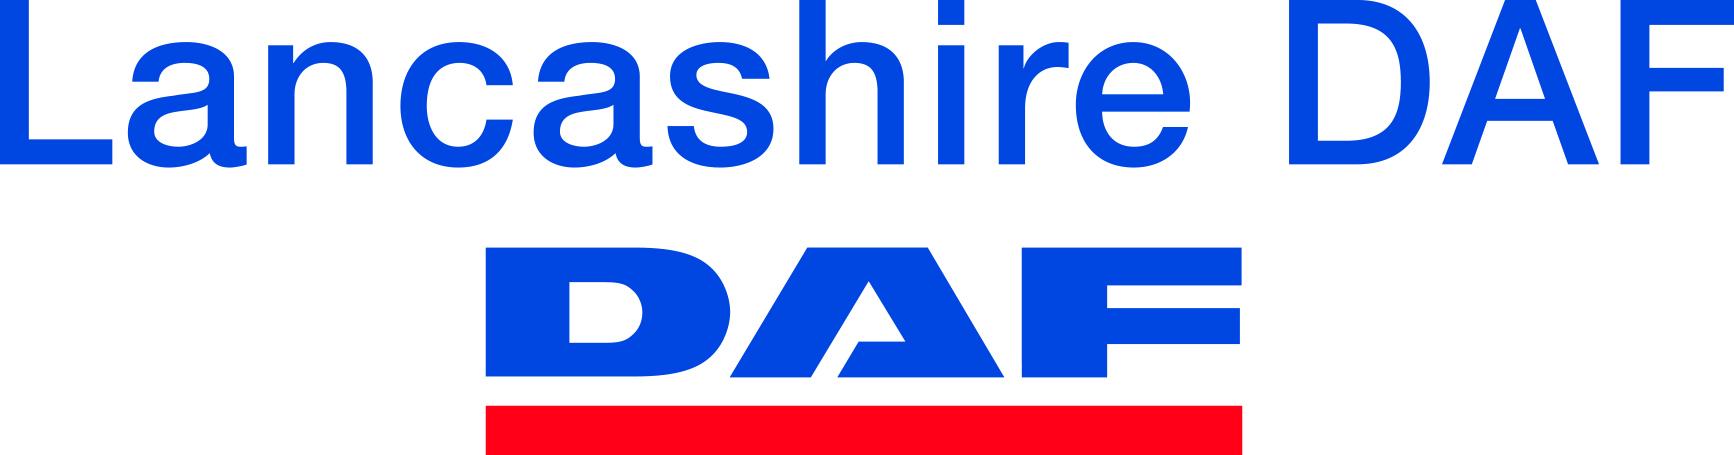 Lancashire DAF